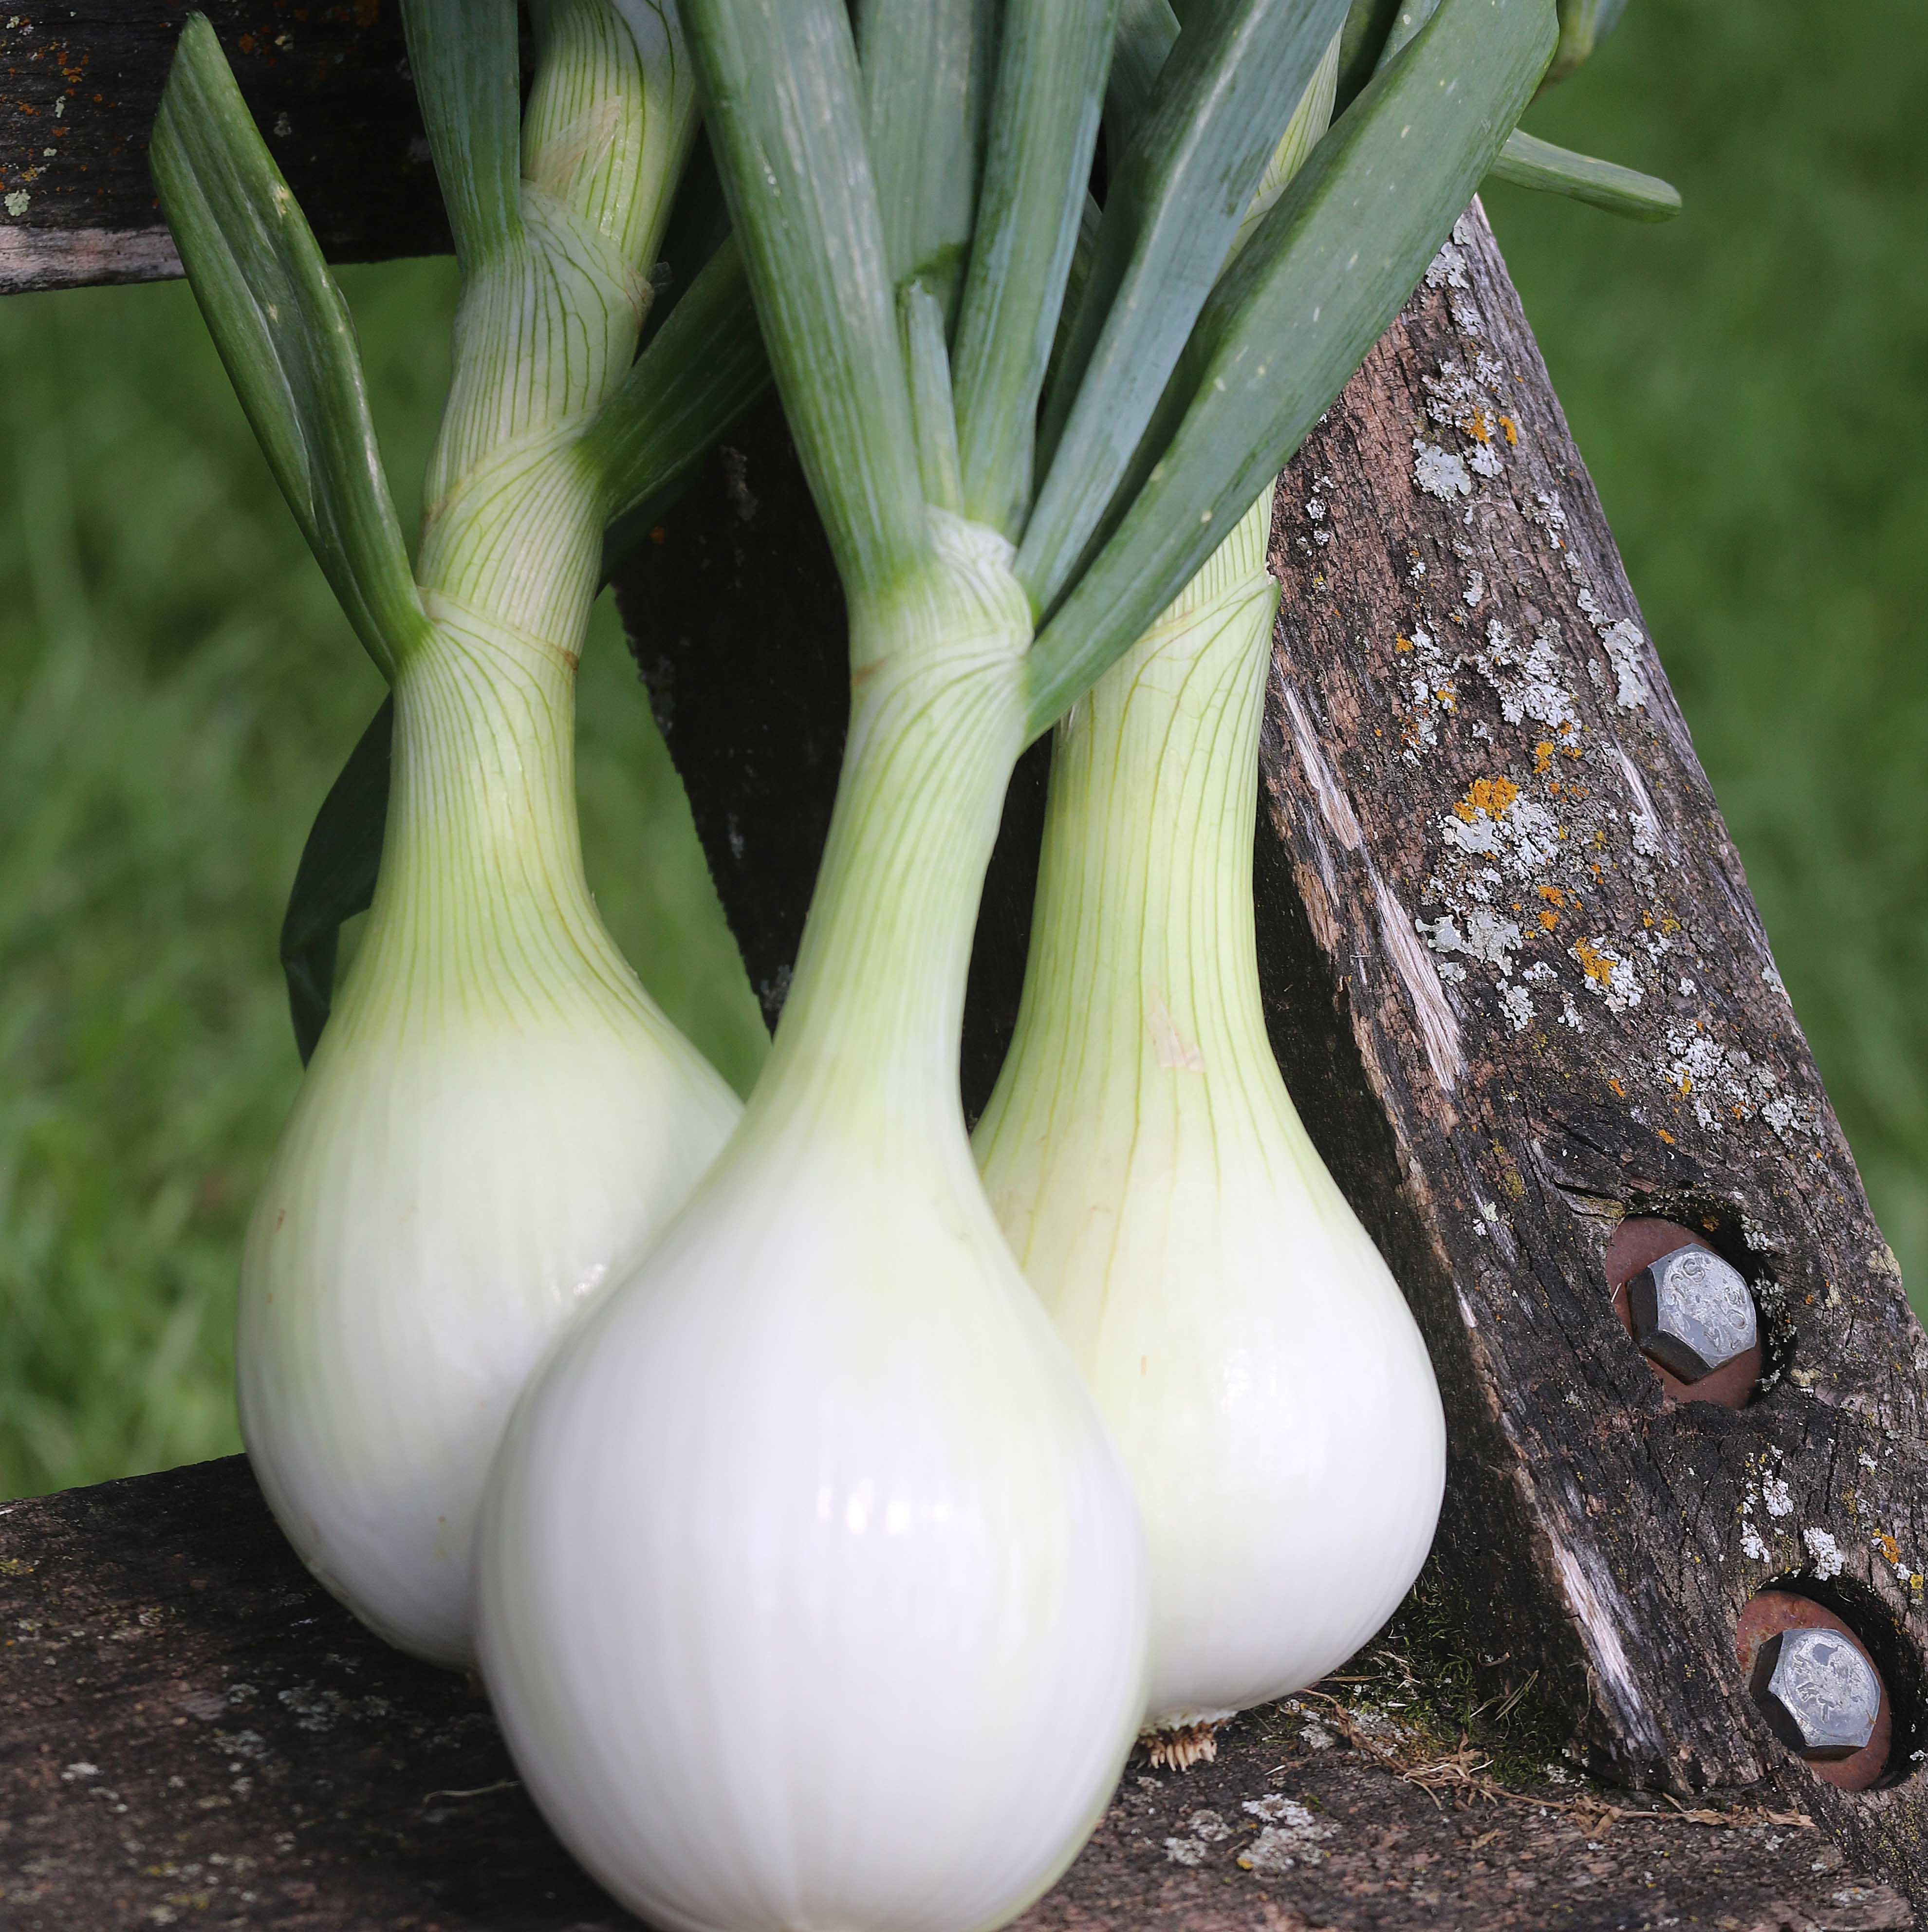 Onion, Ailsa Craig